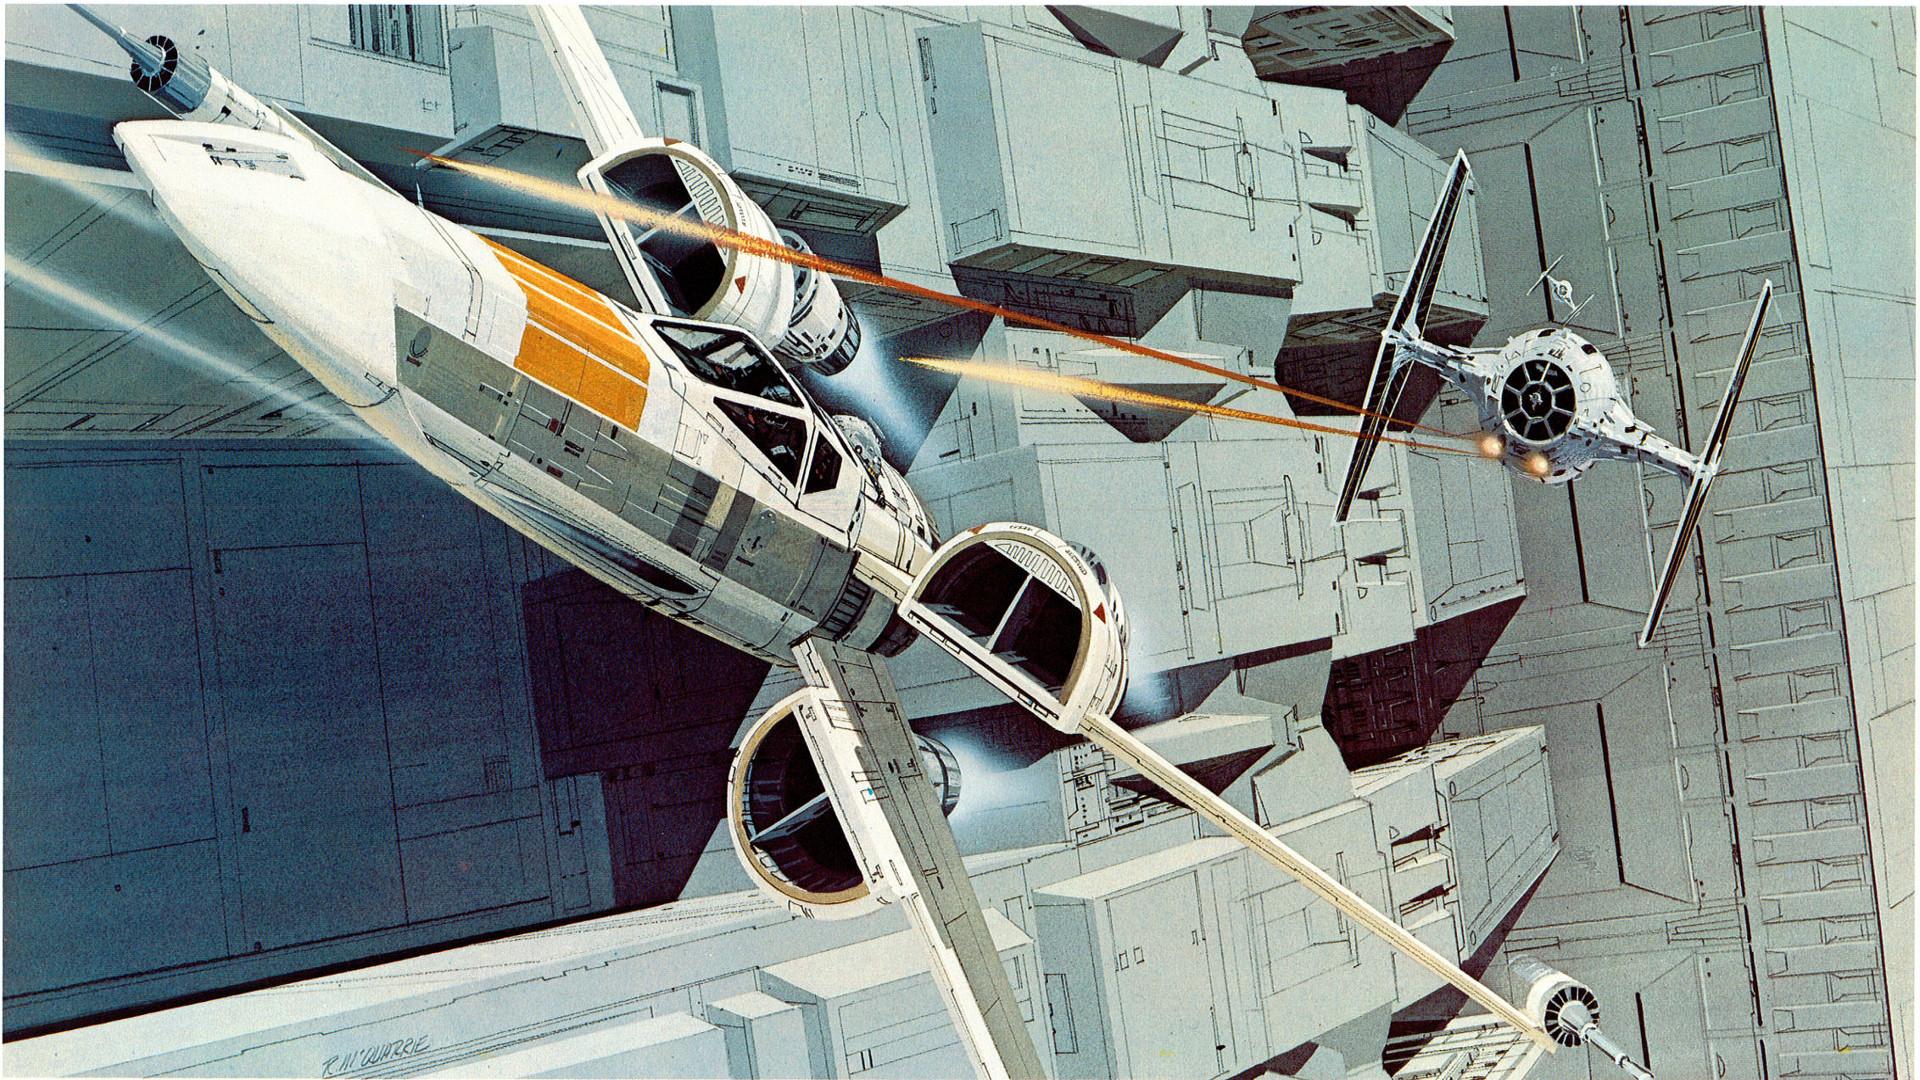 Star Wars Retro Wallpapers Wallpaper Cave